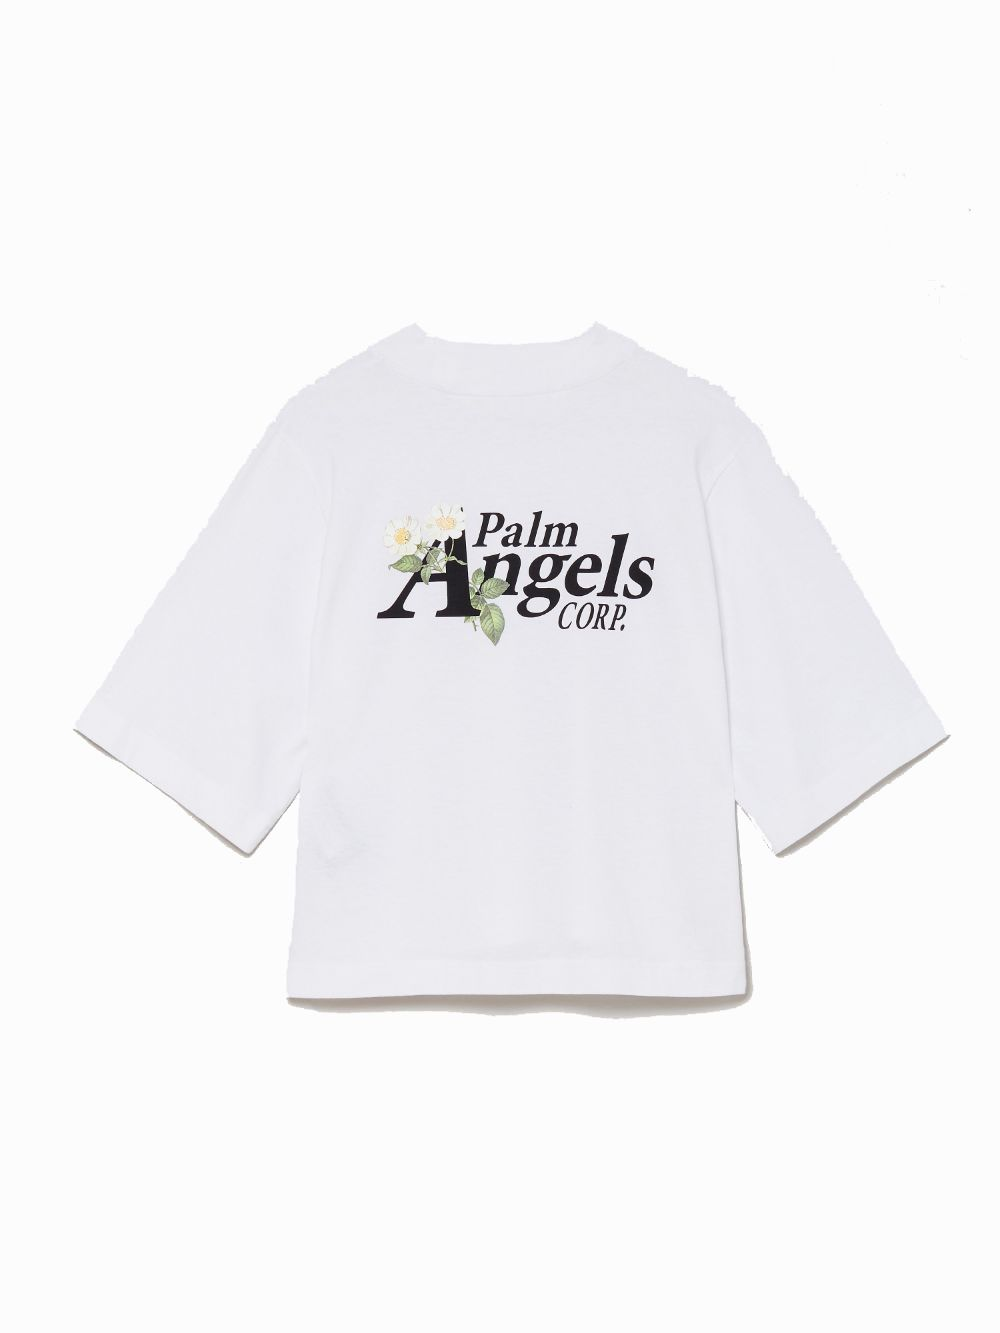 PALM ANGELS T-shirts PALM ANGELS WOMEN'S WHITE COTTON T-SHIRT